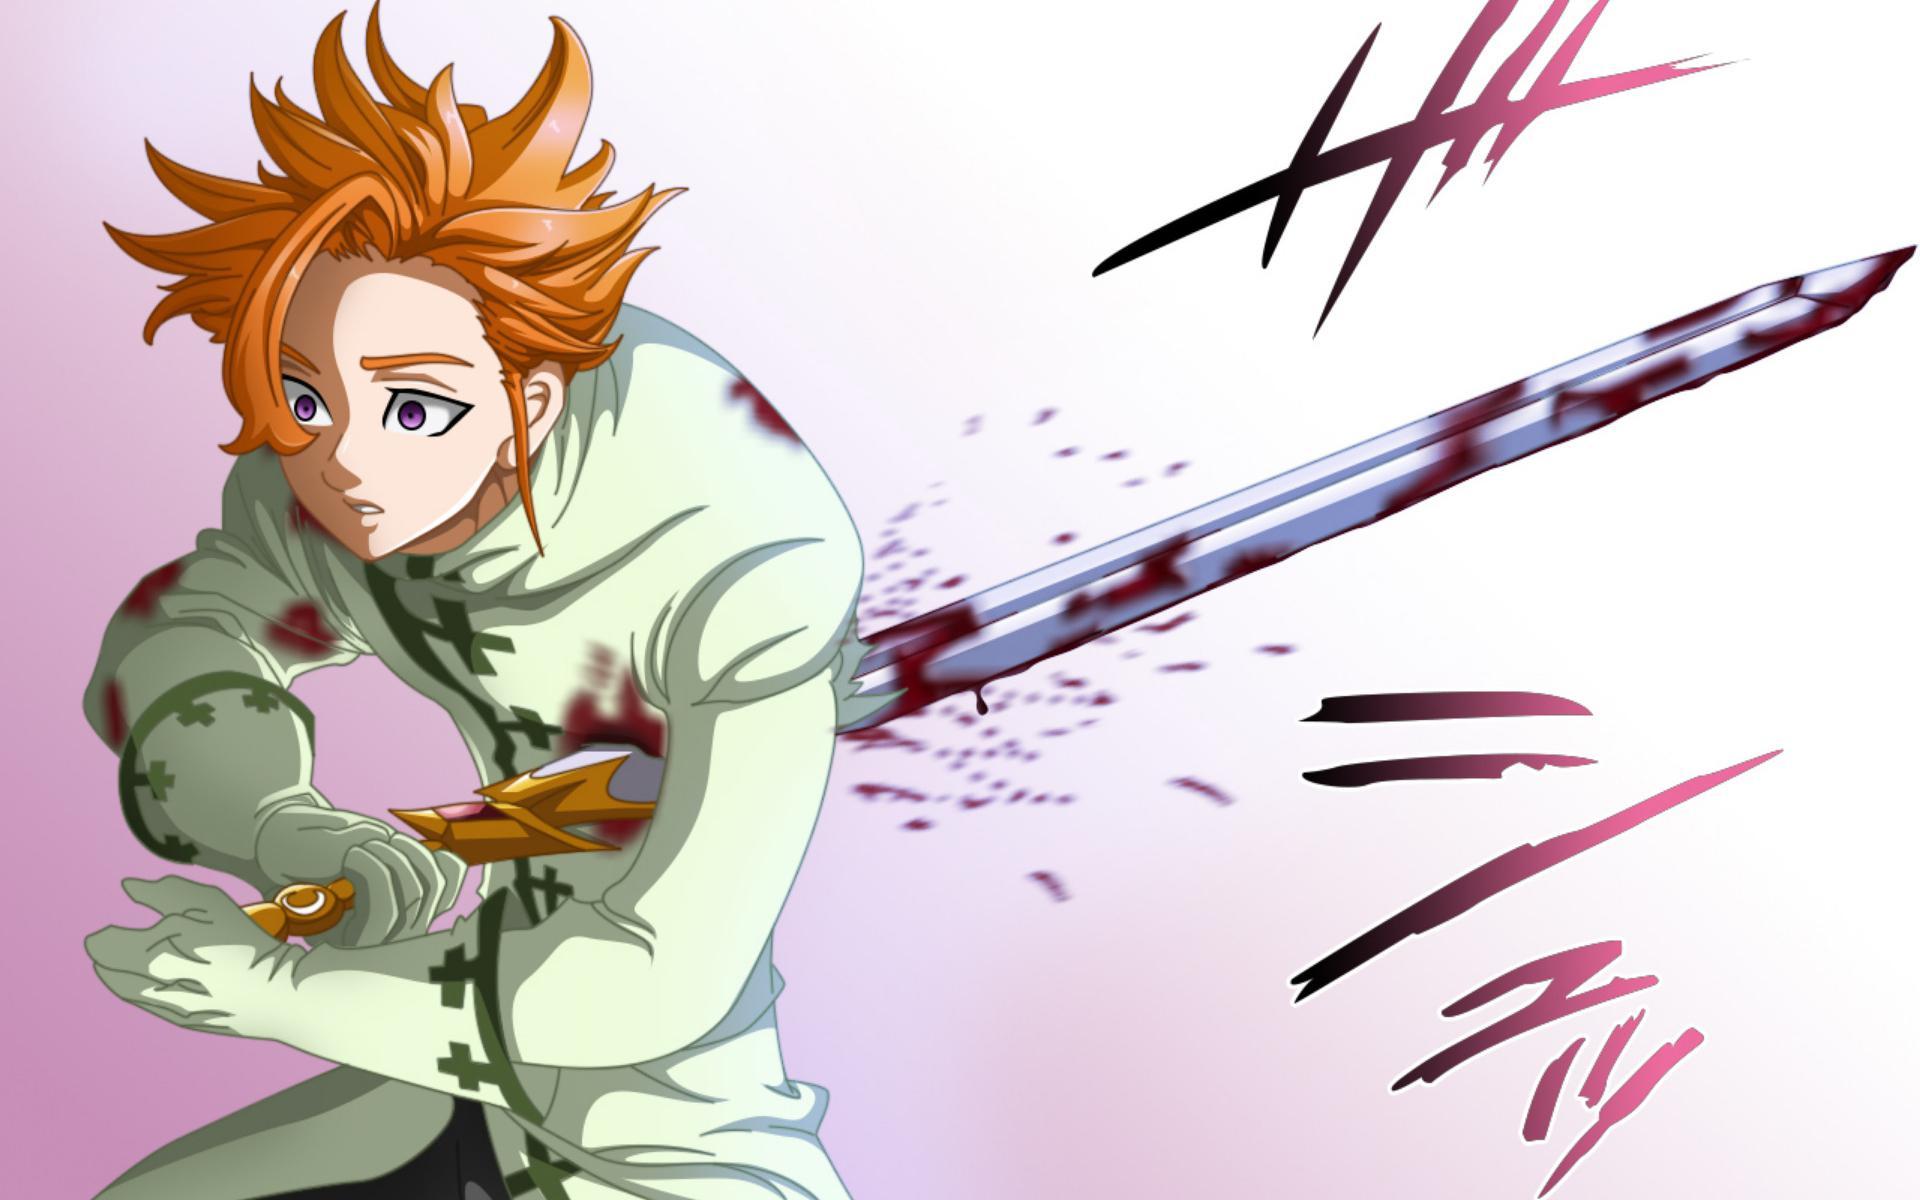 Wallpaper Manga King Nanatsu No Taizai The Seven Deadly Arthur